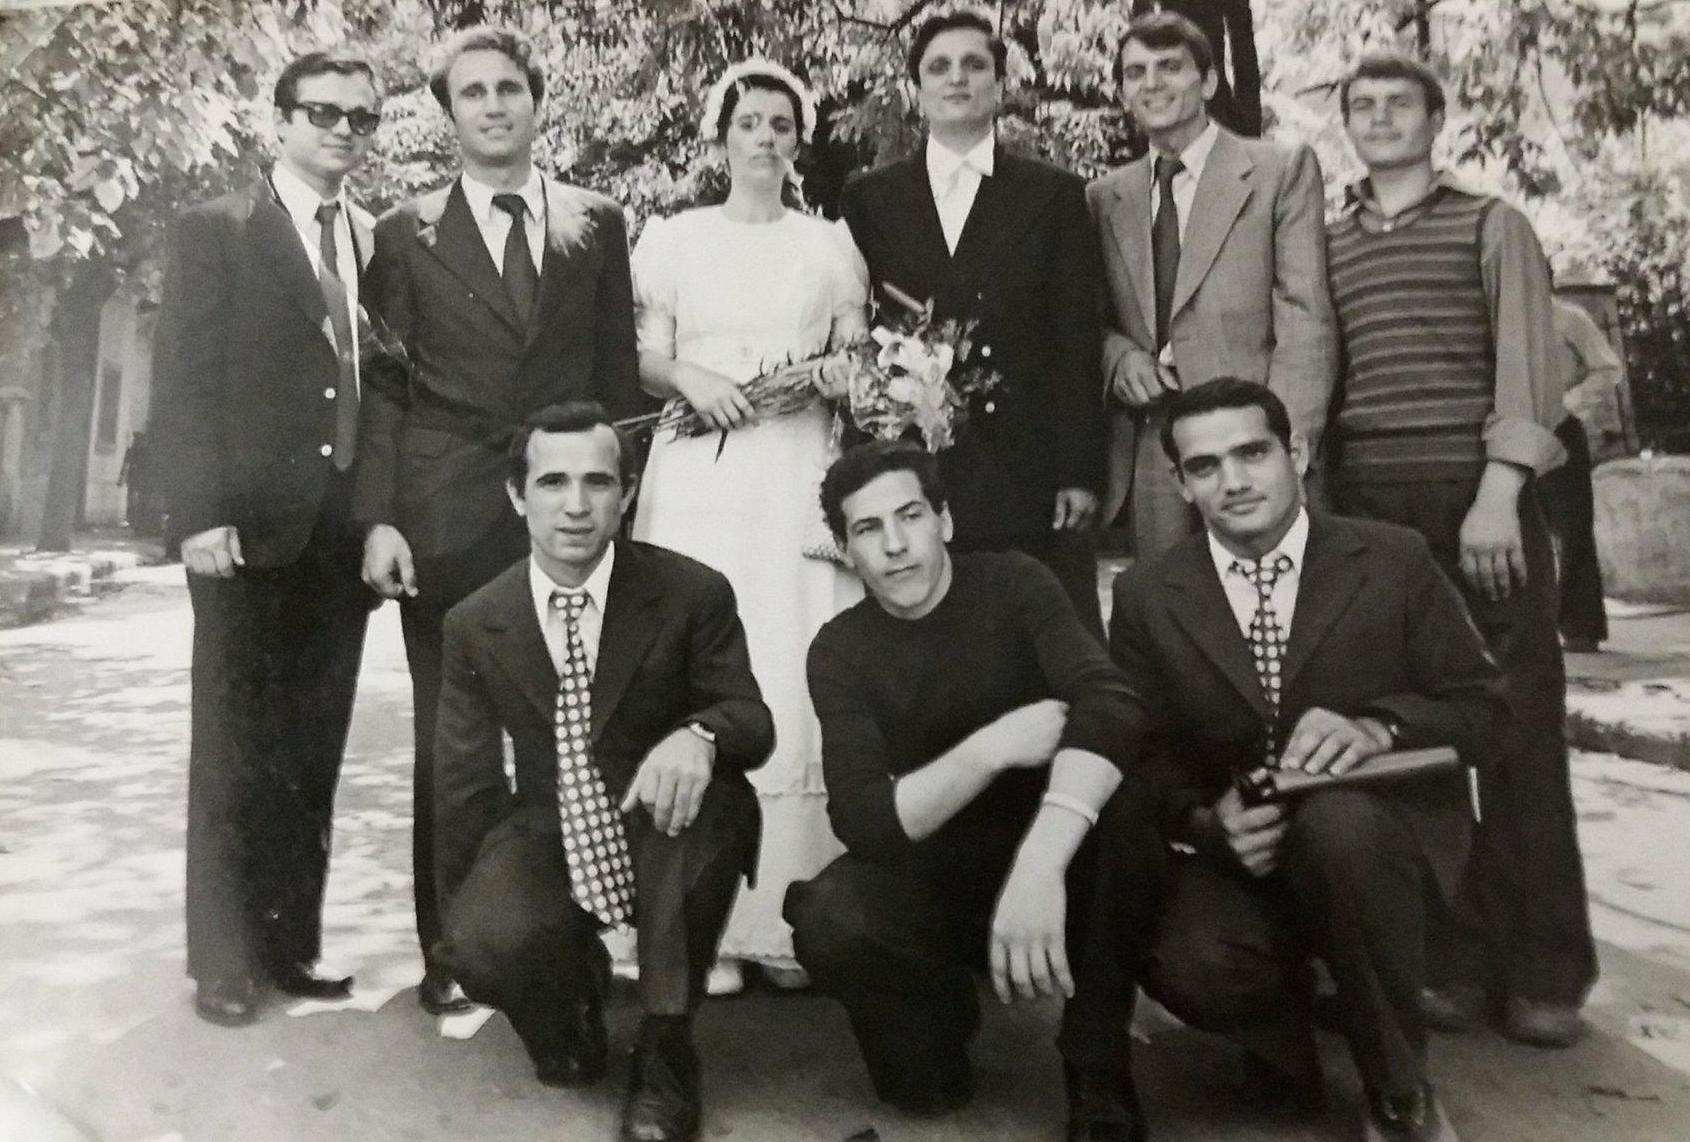 LIVIU GIUROIU, NELU BLONDU SCARLATACHE, REMI ȘI STELA GIUROIU, VIOREL NEAGU, DAMIAN CIUBUC, EUGEN LUPU, EUGEN CÂRLESCU, VASILE CHIRILĂ ÎN 1978